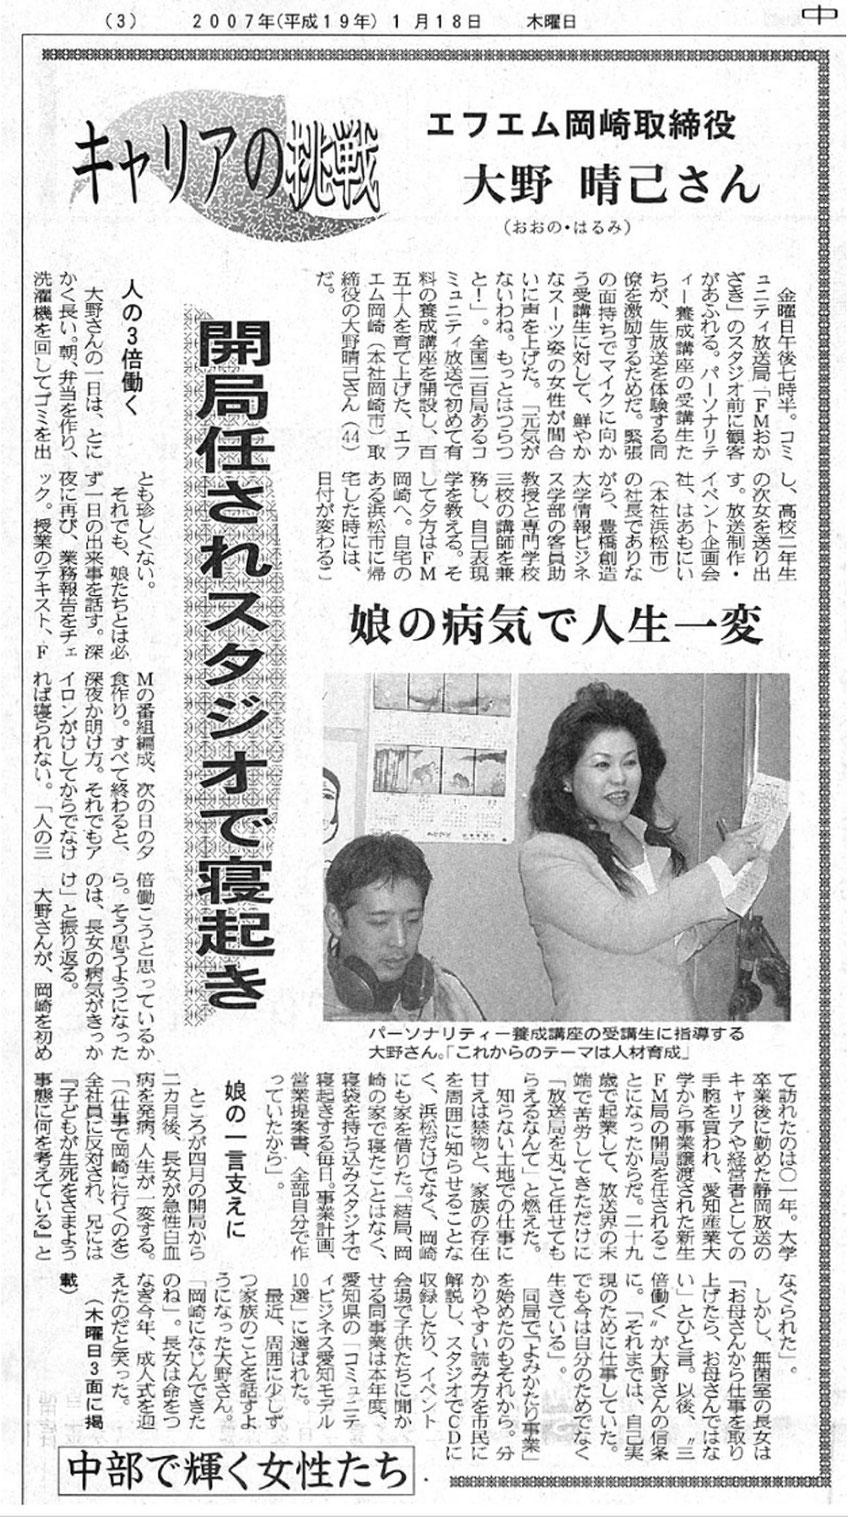 2007年1月 中日新聞に掲載